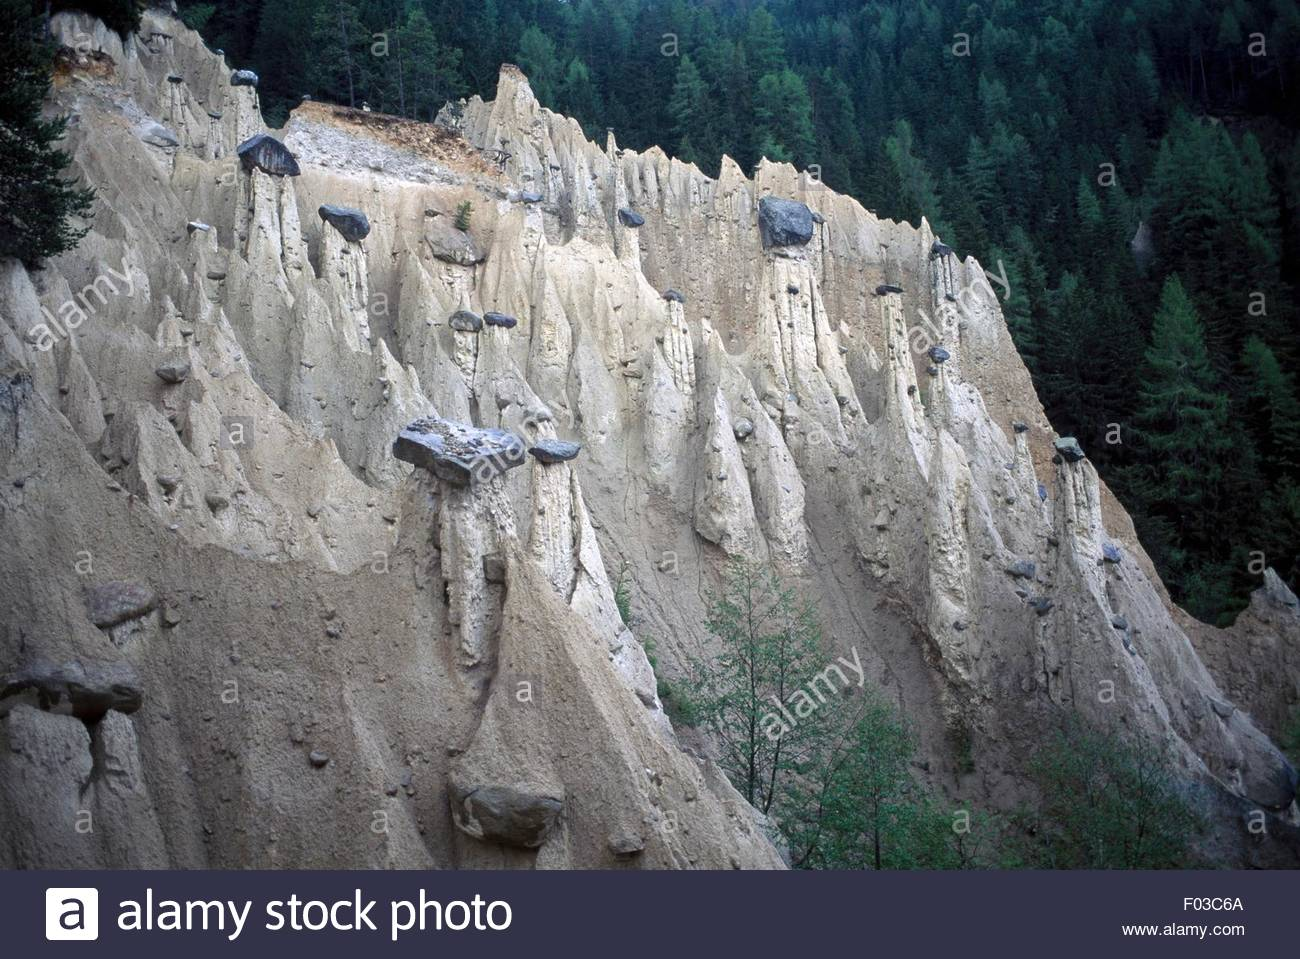 Earth Pyramids In Perca, Ahrntal Valley, Trentino.